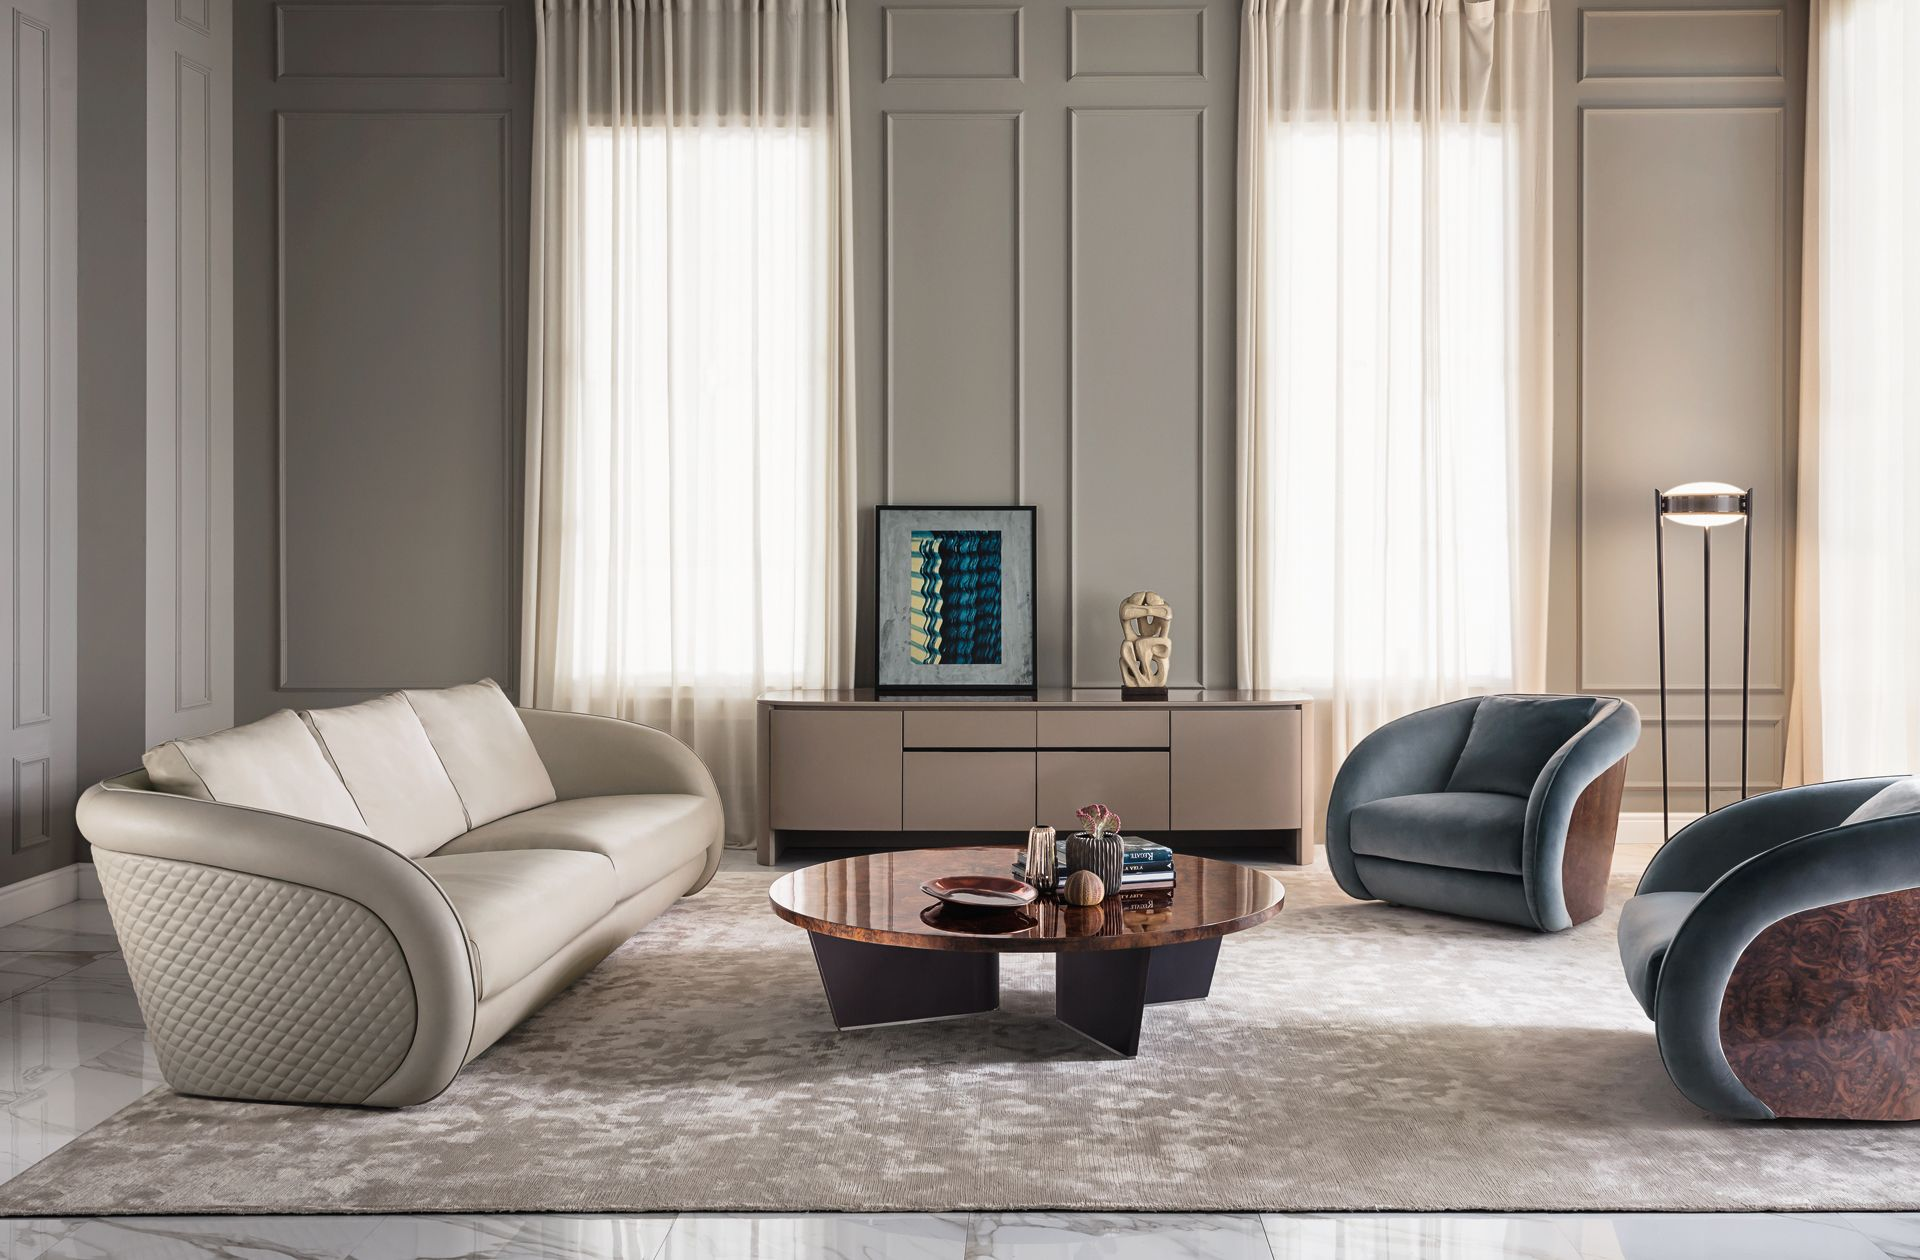 Pin By Sarah Thomas On Namit Malhotra S House Italian Furniture